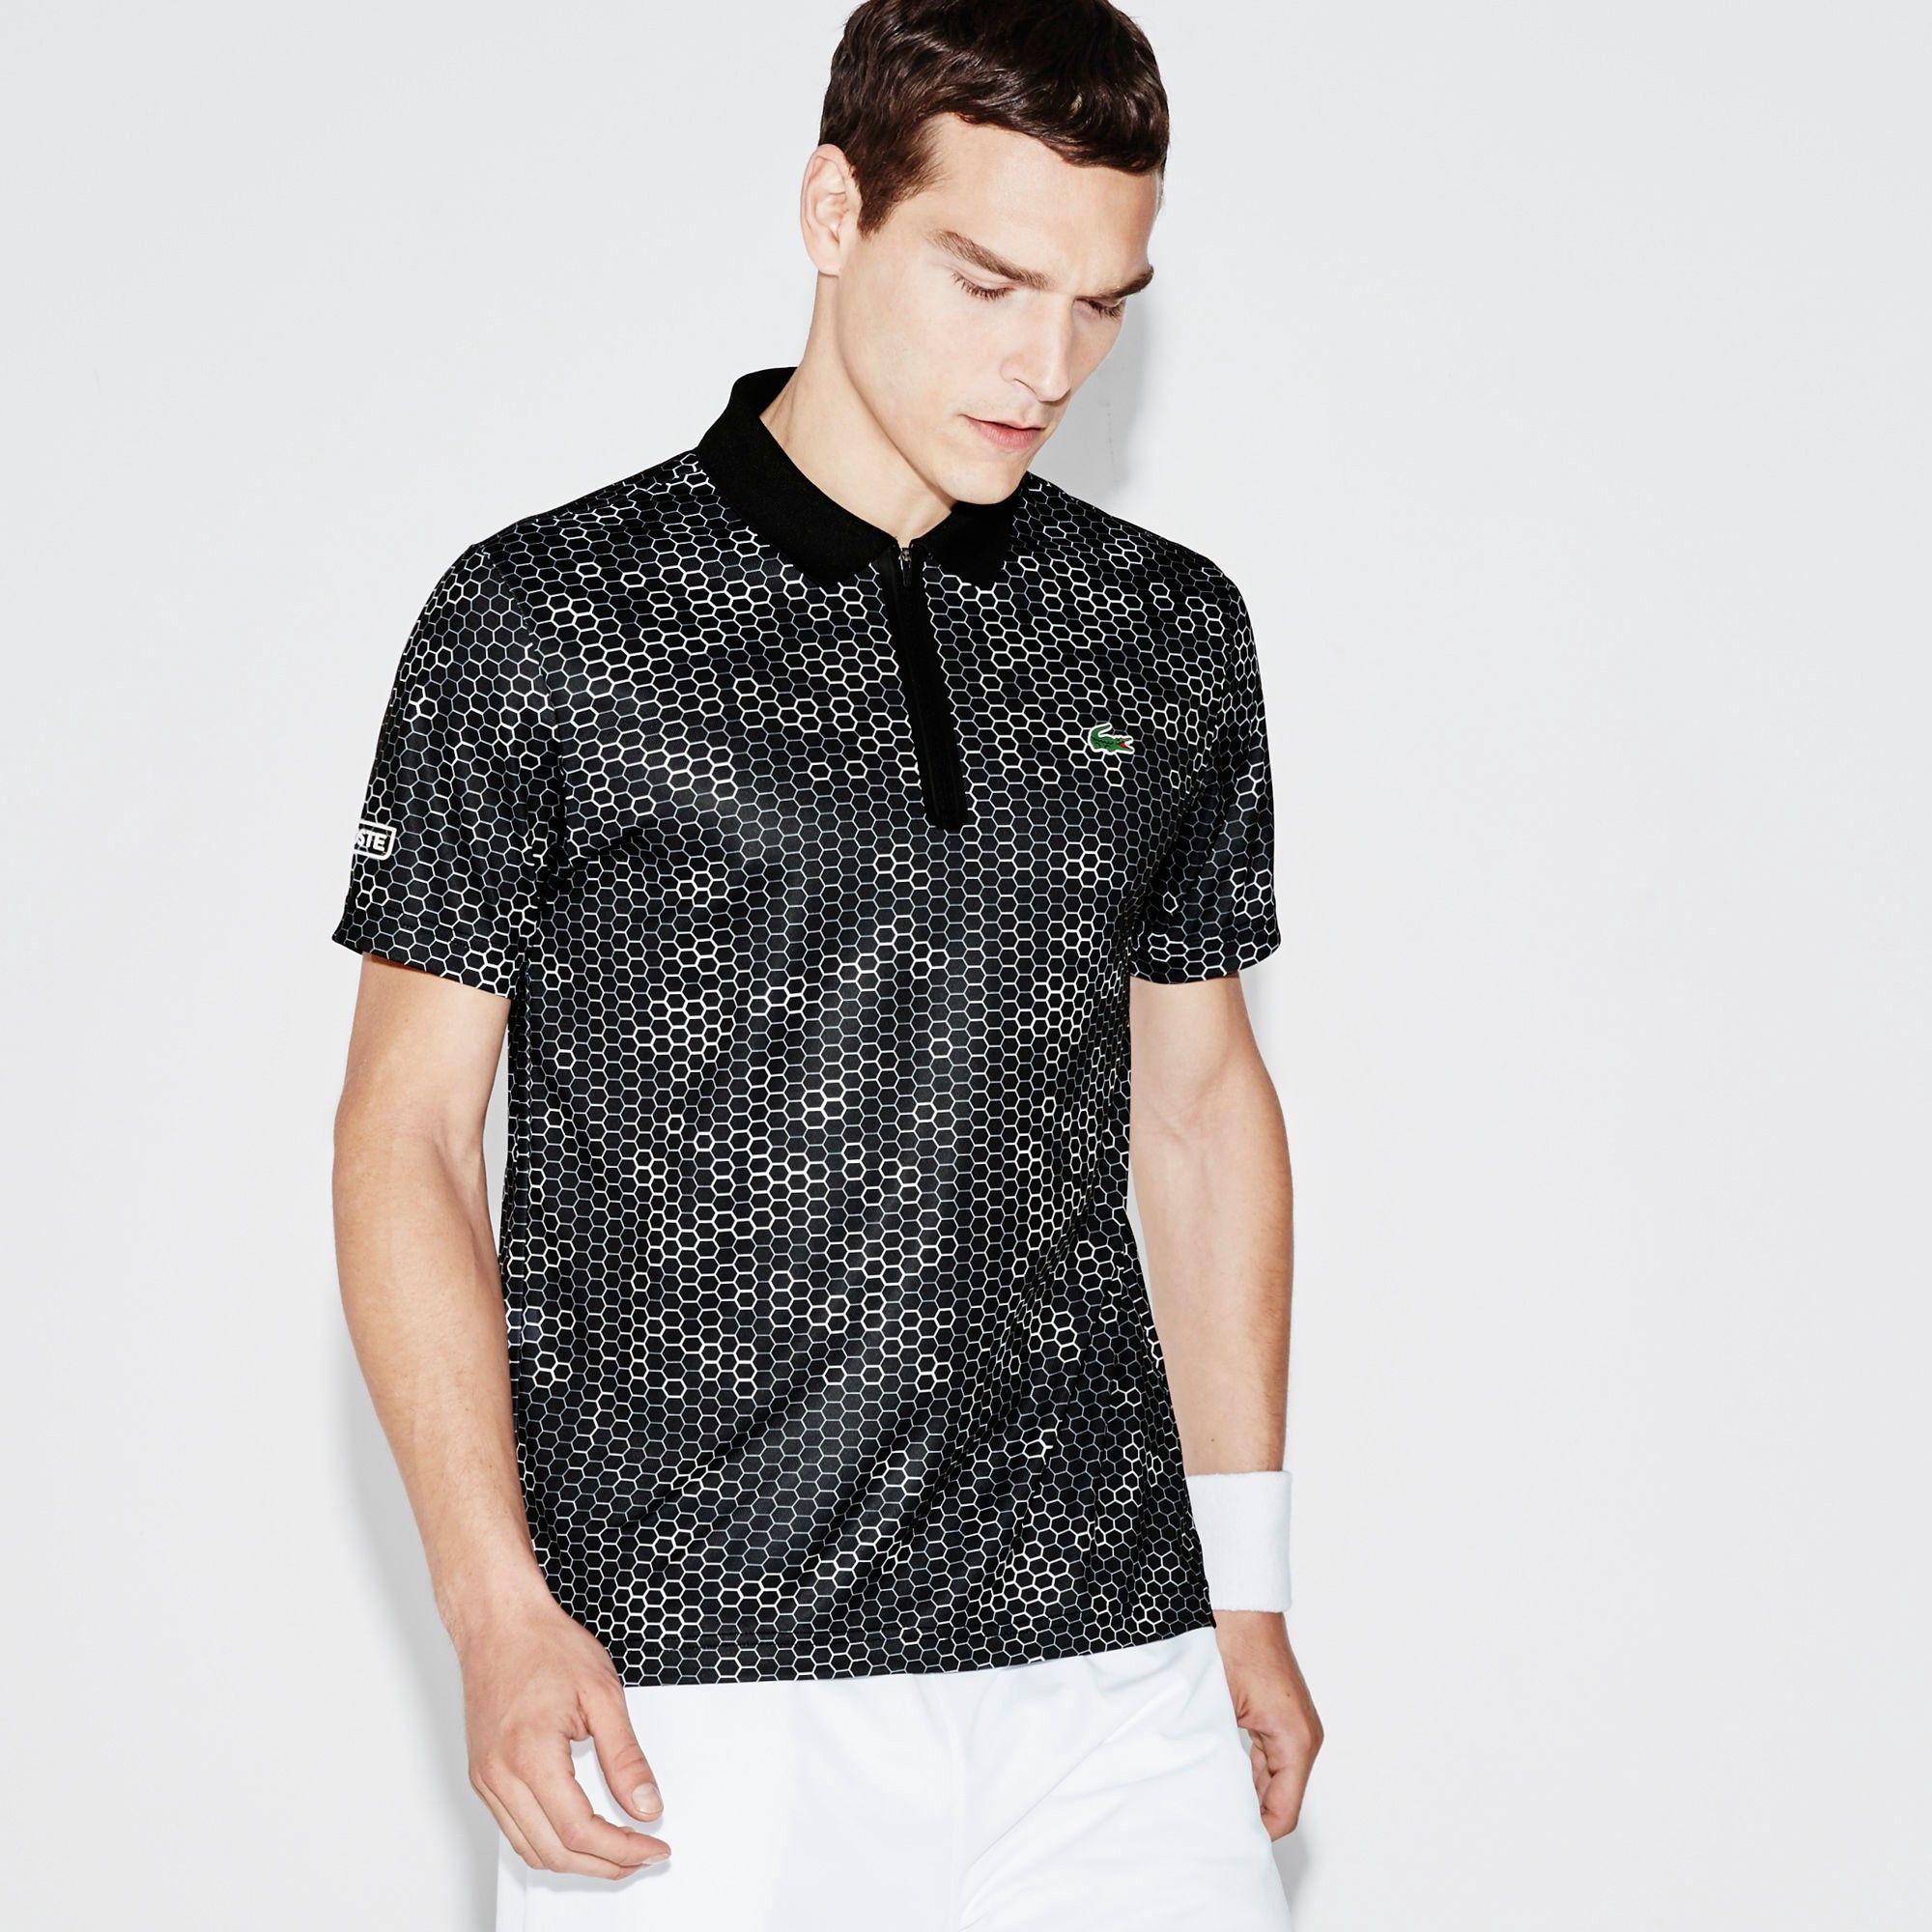 77492ca6 LACOSTE Men's SPORT Ultra Dry Zip Tennis Polo Shirt - black/white,black. # lacoste #cloth #all